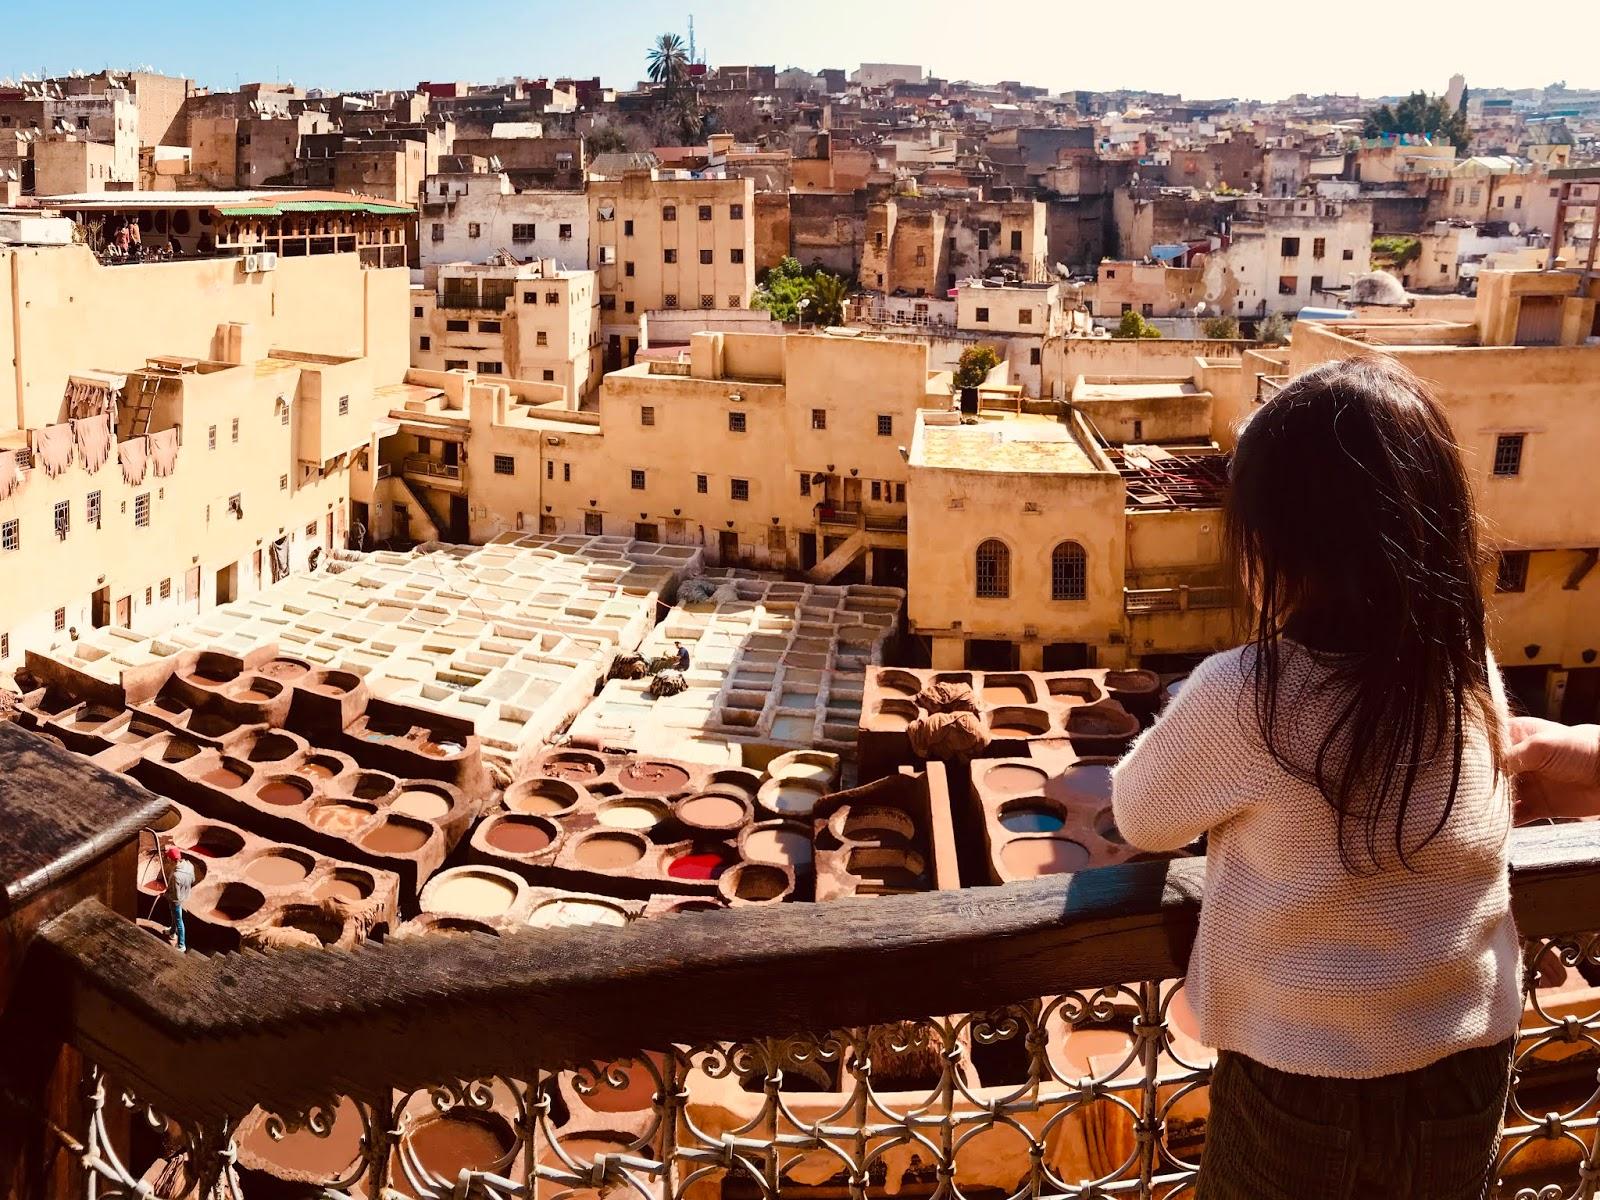 Love MiMi 愛咪咪 愛自遊: [Fez] 摩洛哥千年古城之最!土耳其浴 民宿 美食 景點 - 菲斯親子遊自助攻略